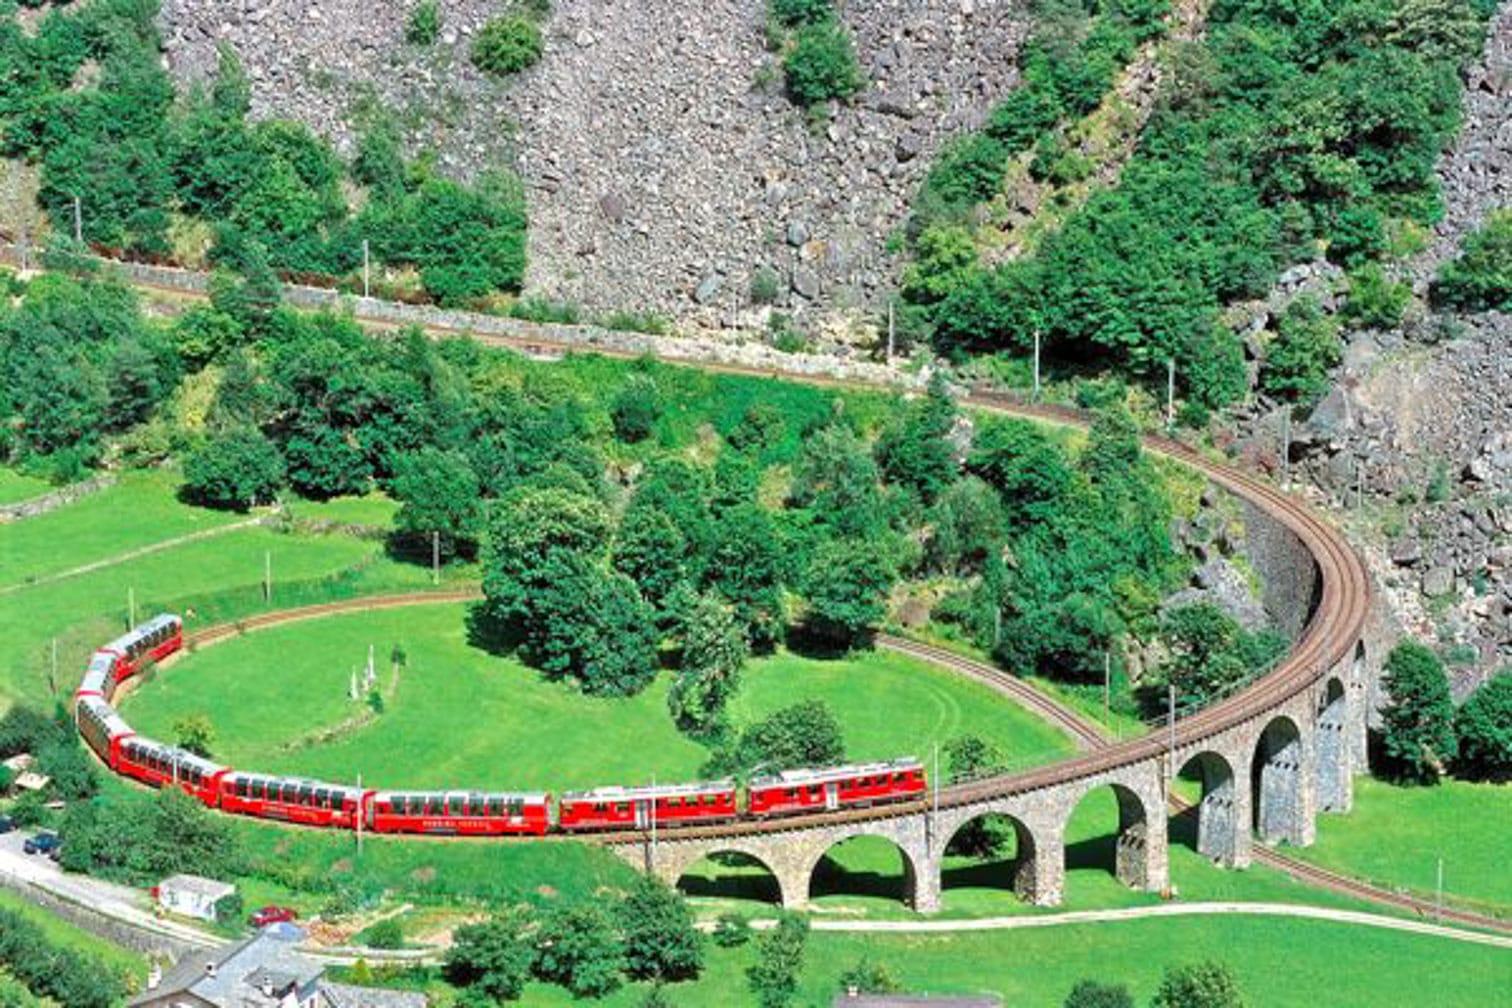 The Bernina Express on the well-known circle viaduct near Brusio. (Photo: Rhaetische Bahn; swiss-image.ch/Peter Donatsch)